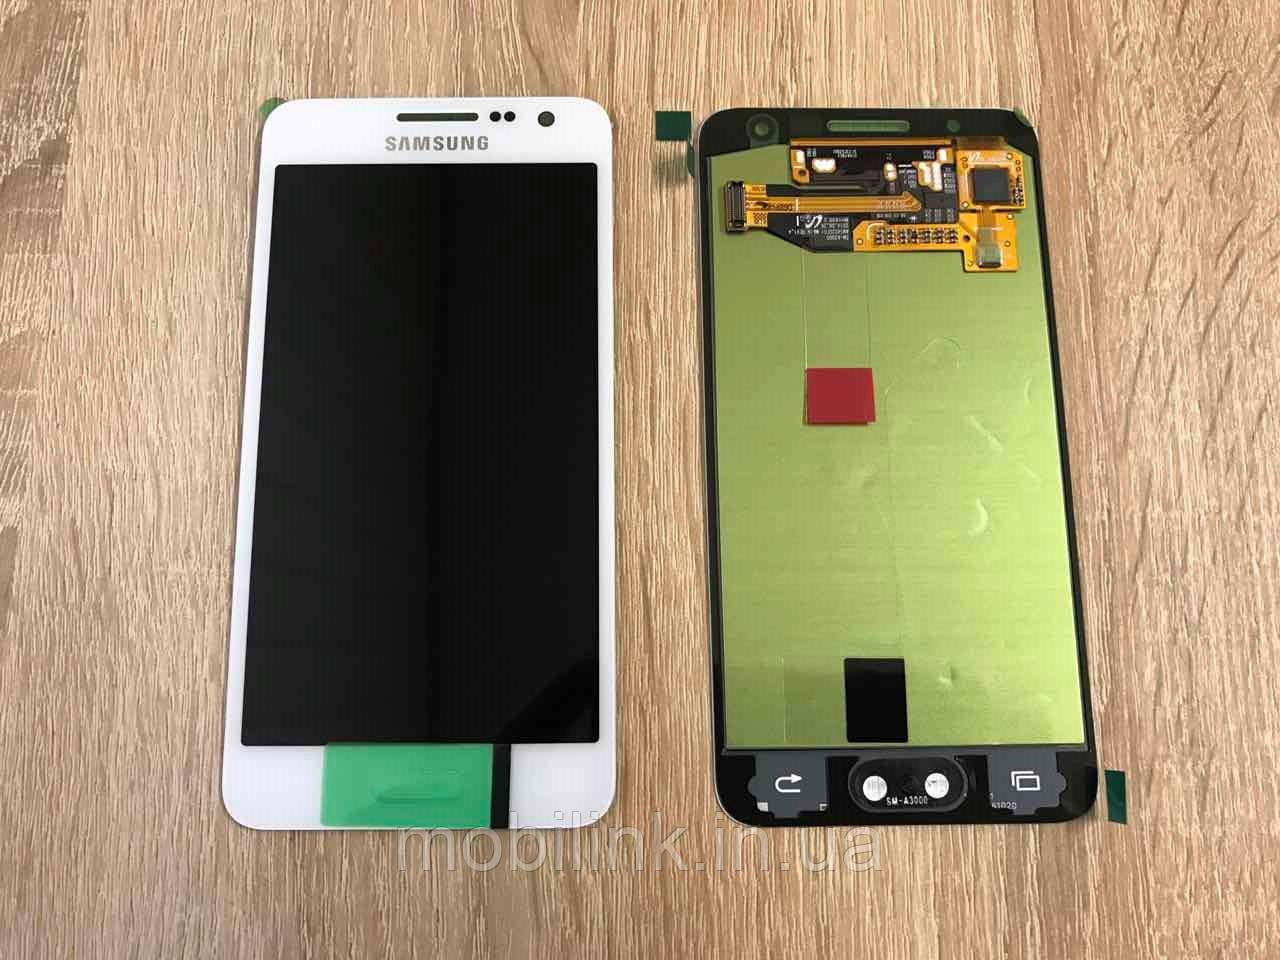 Дисплей на Samsung A300 Galaxy A3 Белый(White),GH97-16747A, Super AMOLED!